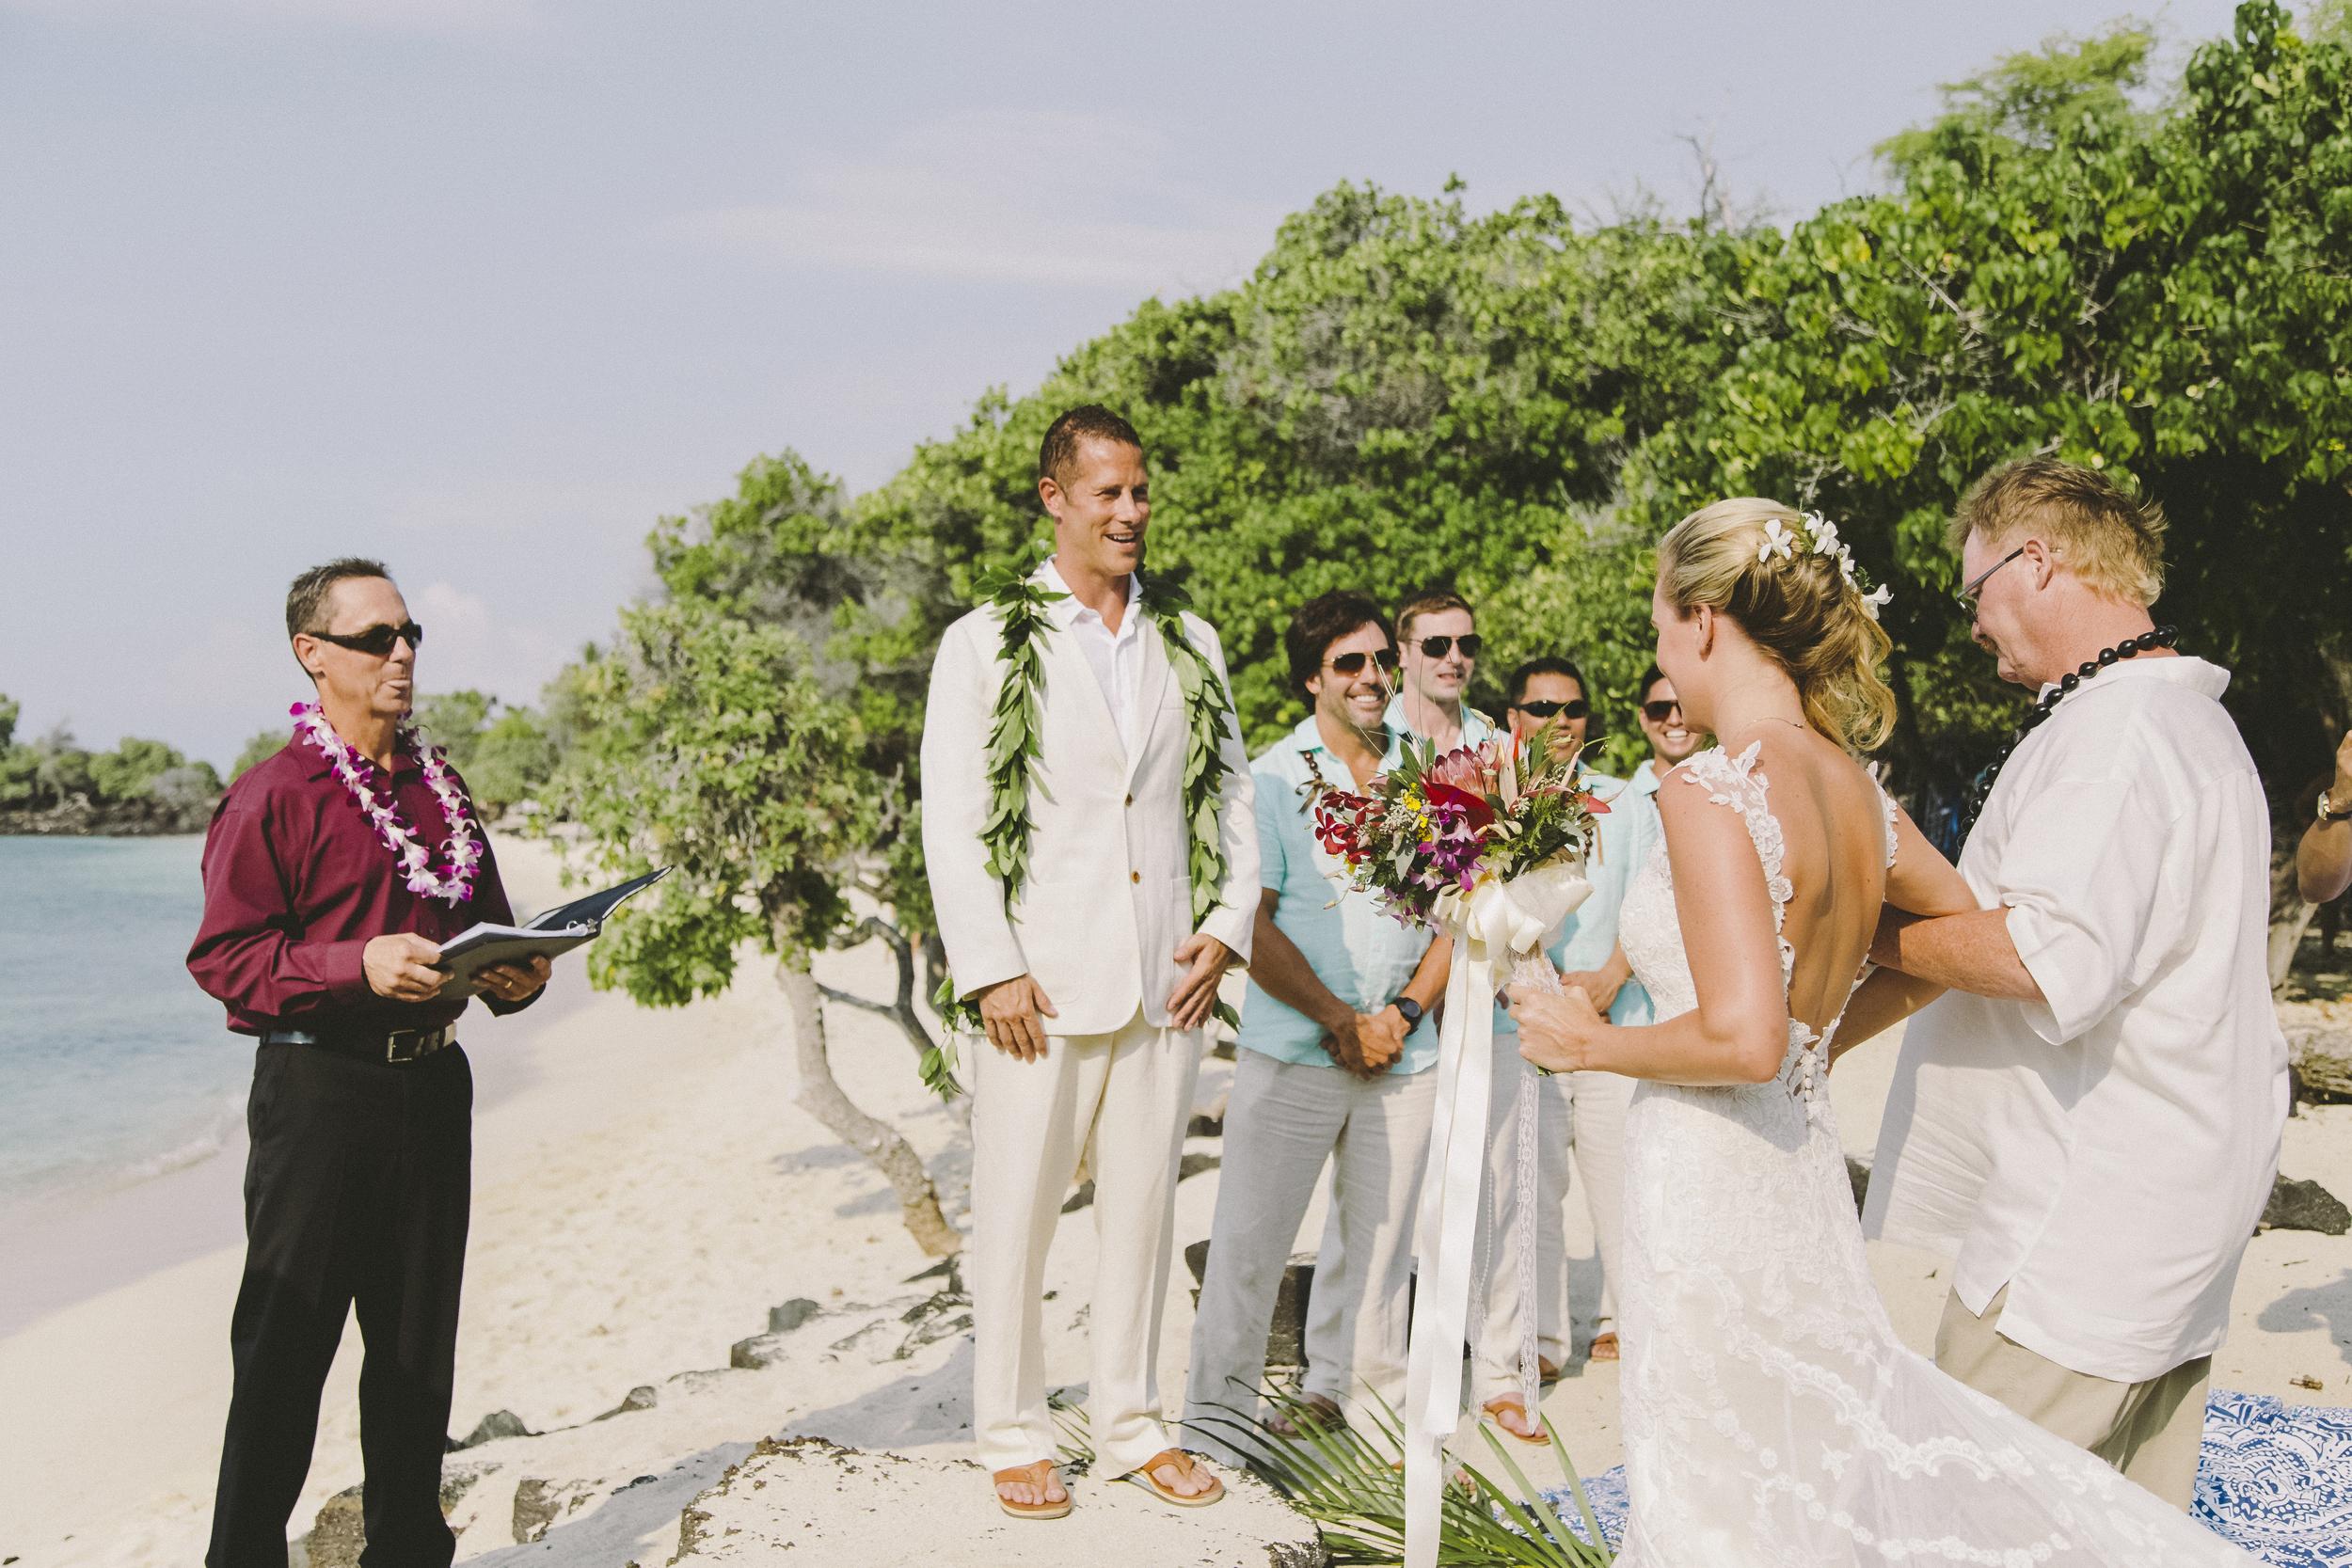 angie-diaz-photography-hawaii-wedding-photographer-kelli-jay-57.jpg